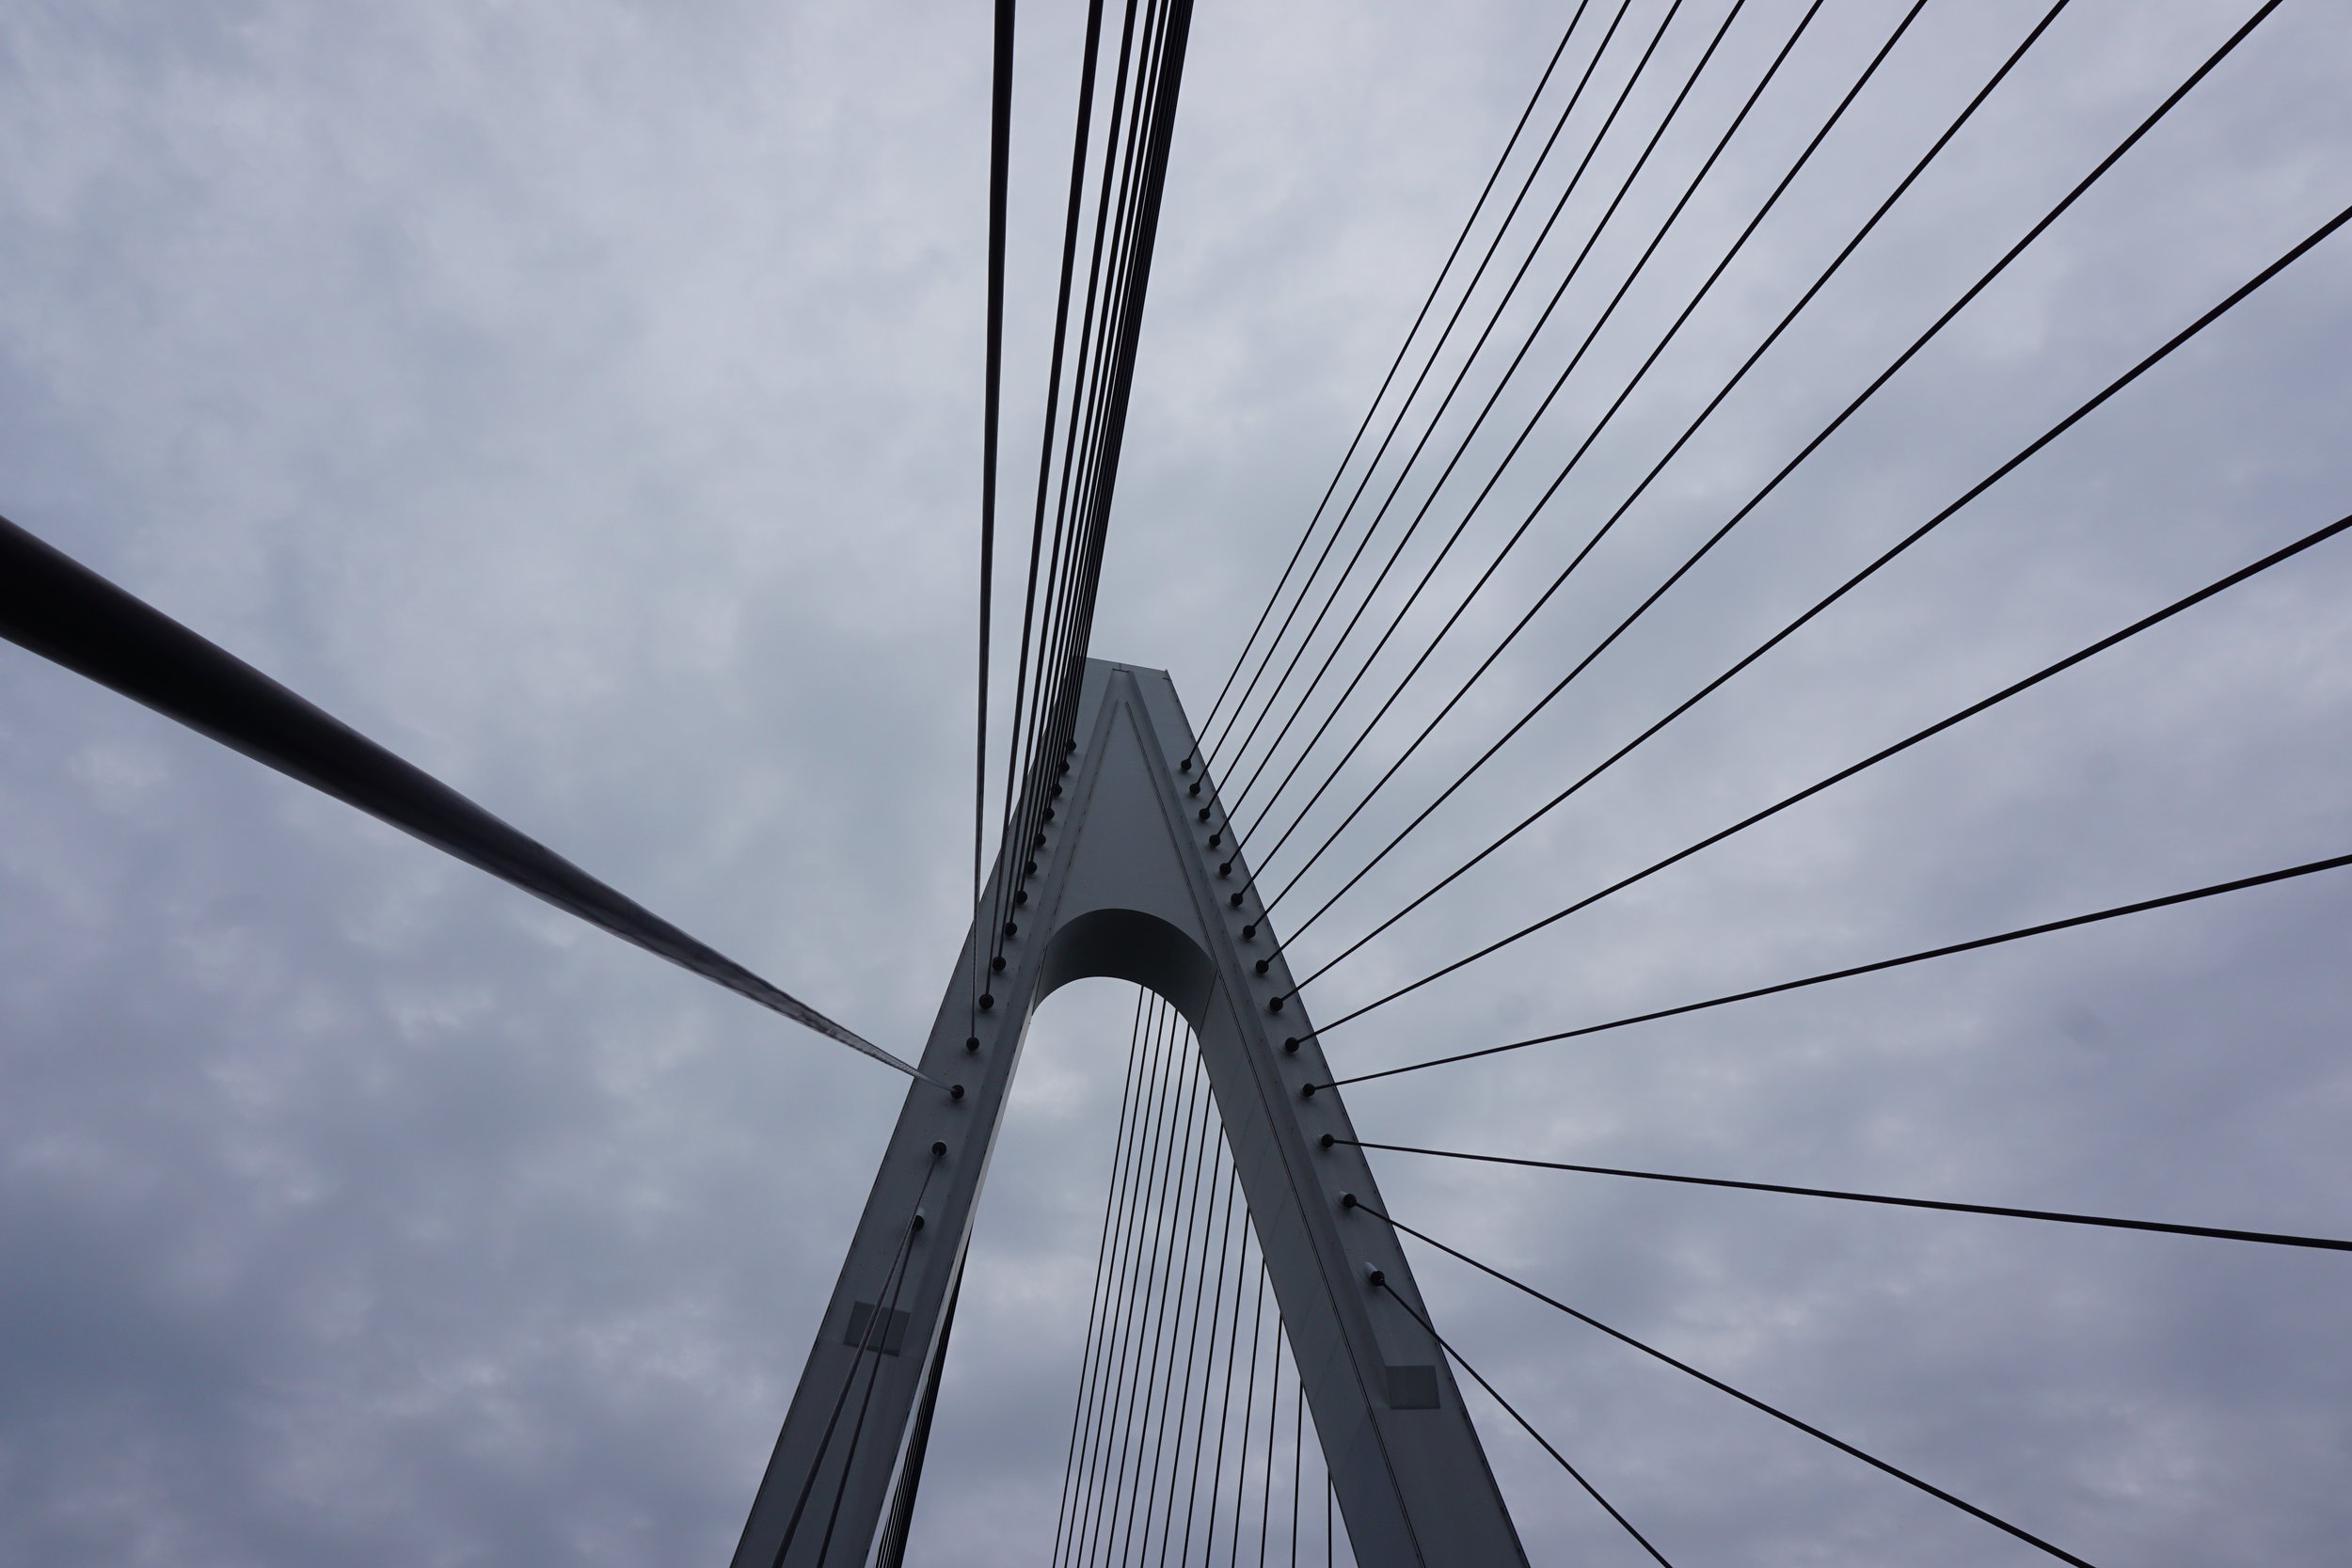 Half-Day - 28.5 KM